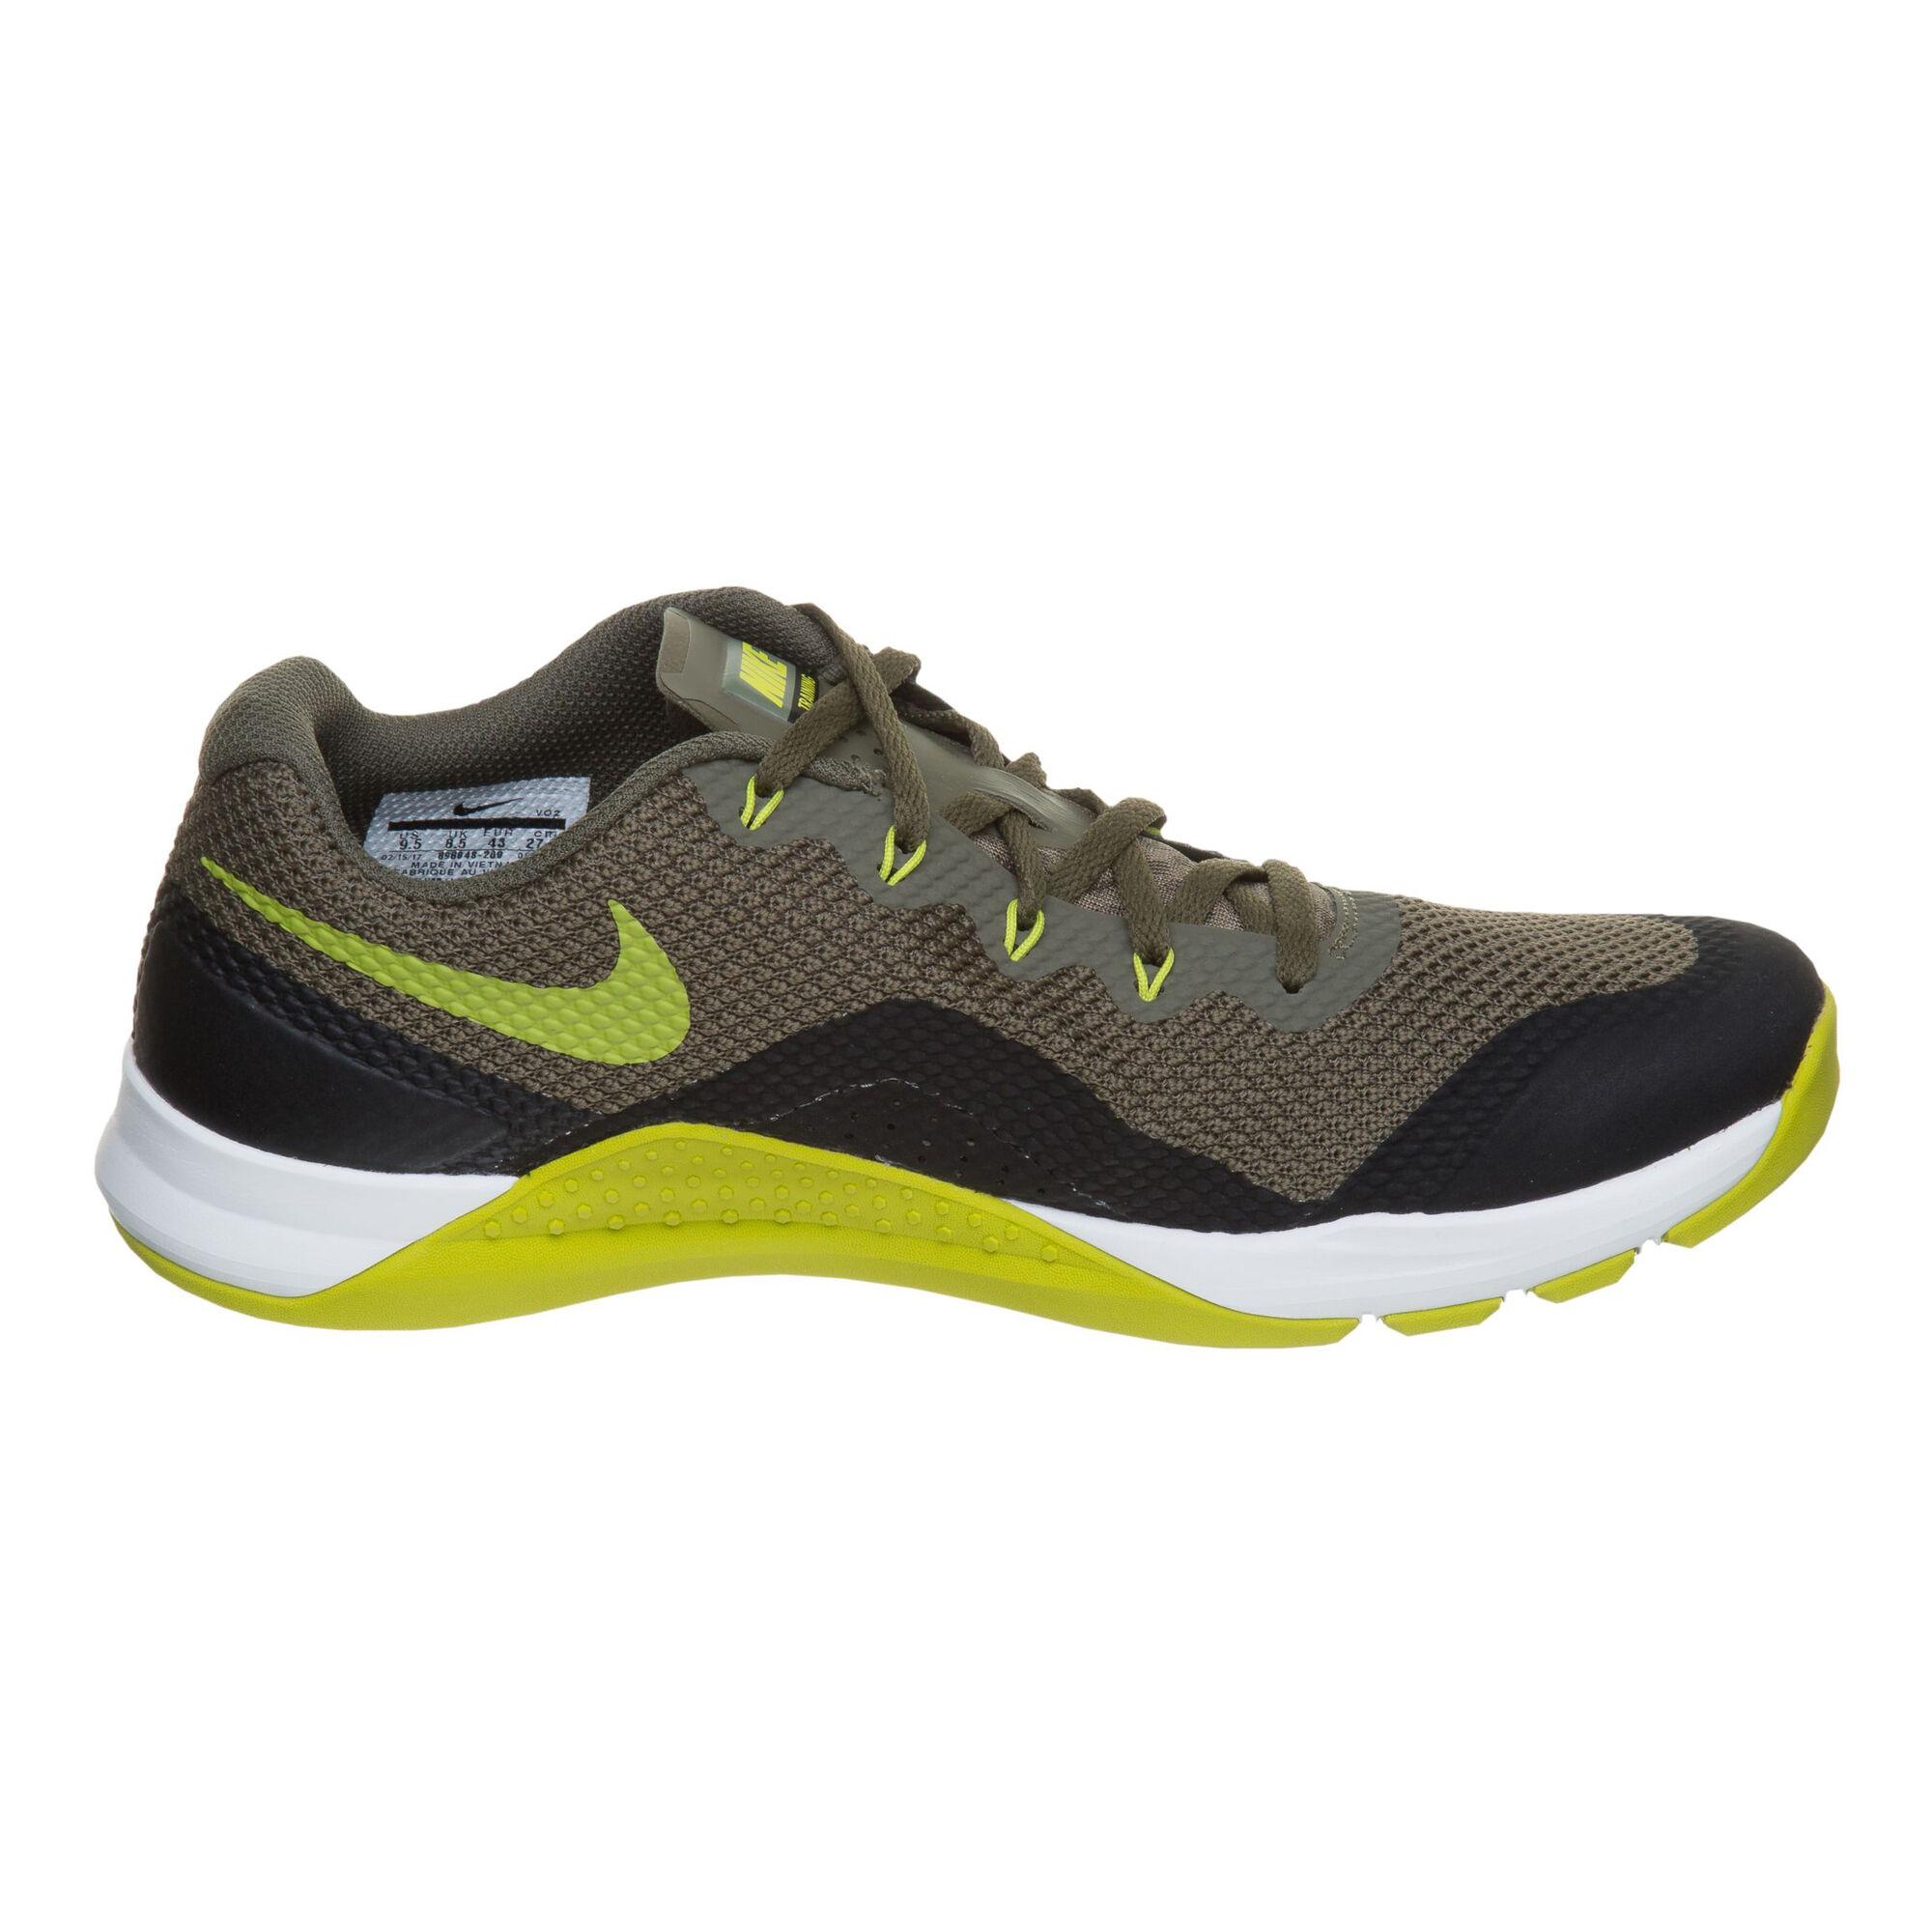 official photos 61b63 61cca Nike  Nike  Nike  Nike  Nike  Nike  Nike  Nike  Nike  Nike. Metcon Repper  DSX Men ...